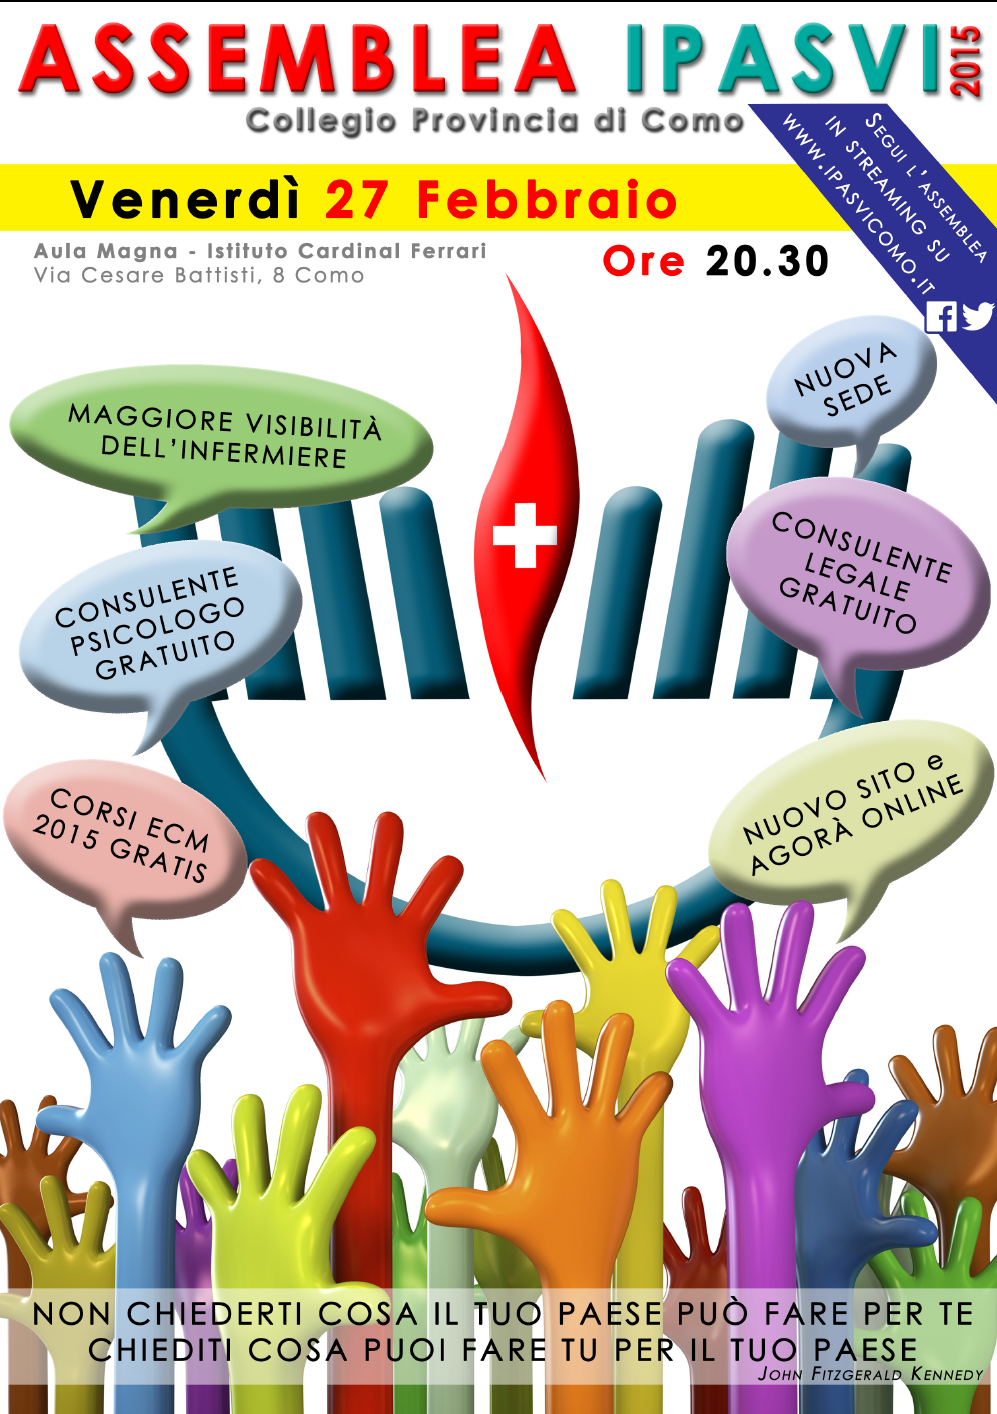 Assemblea IPASVI_Como 2015